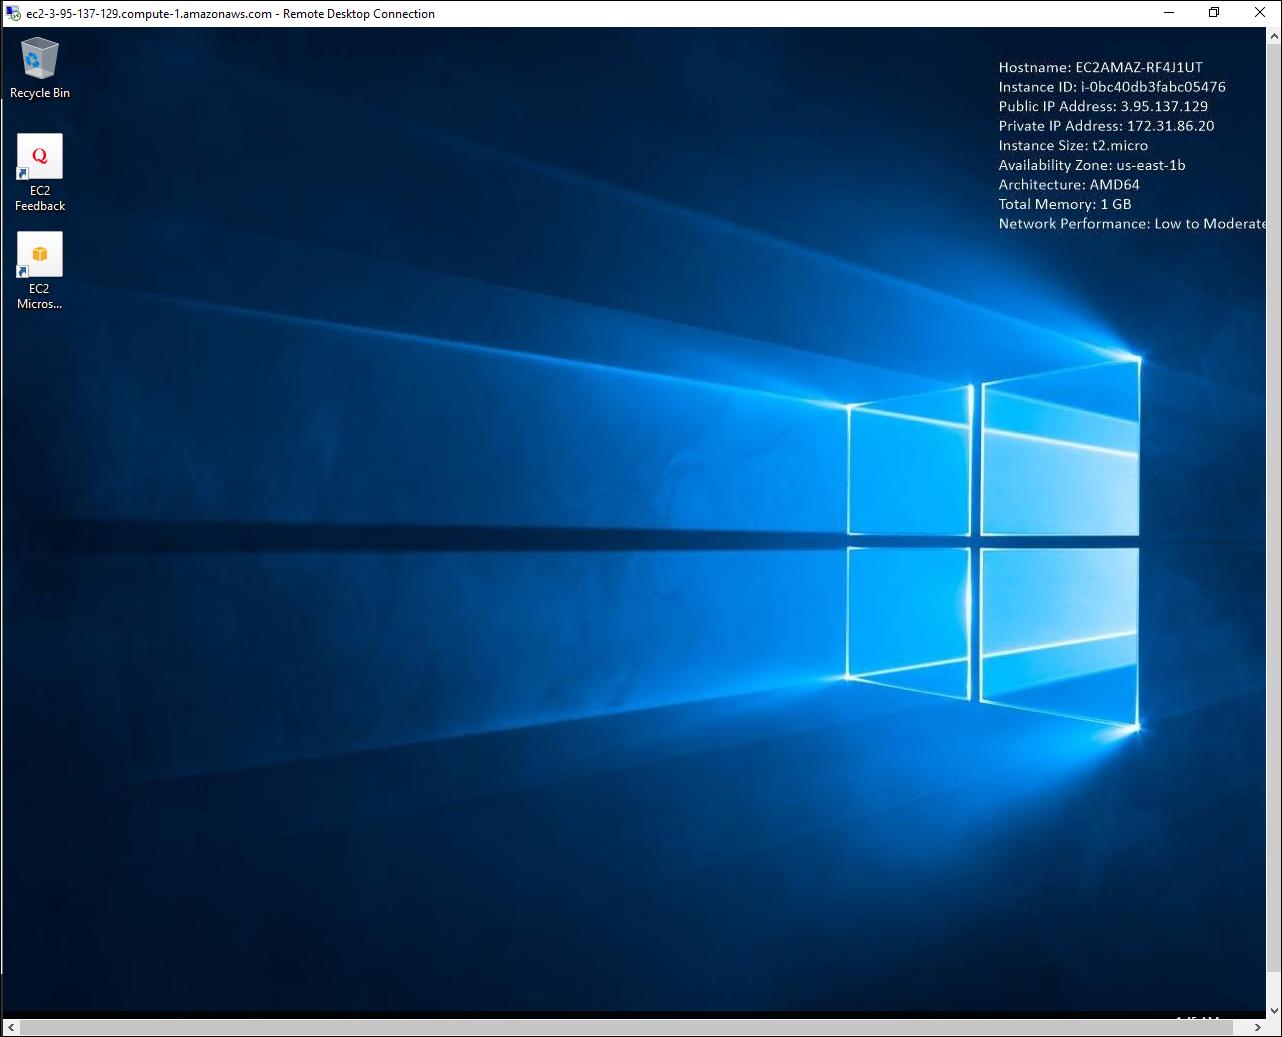 The Windows server desktop.